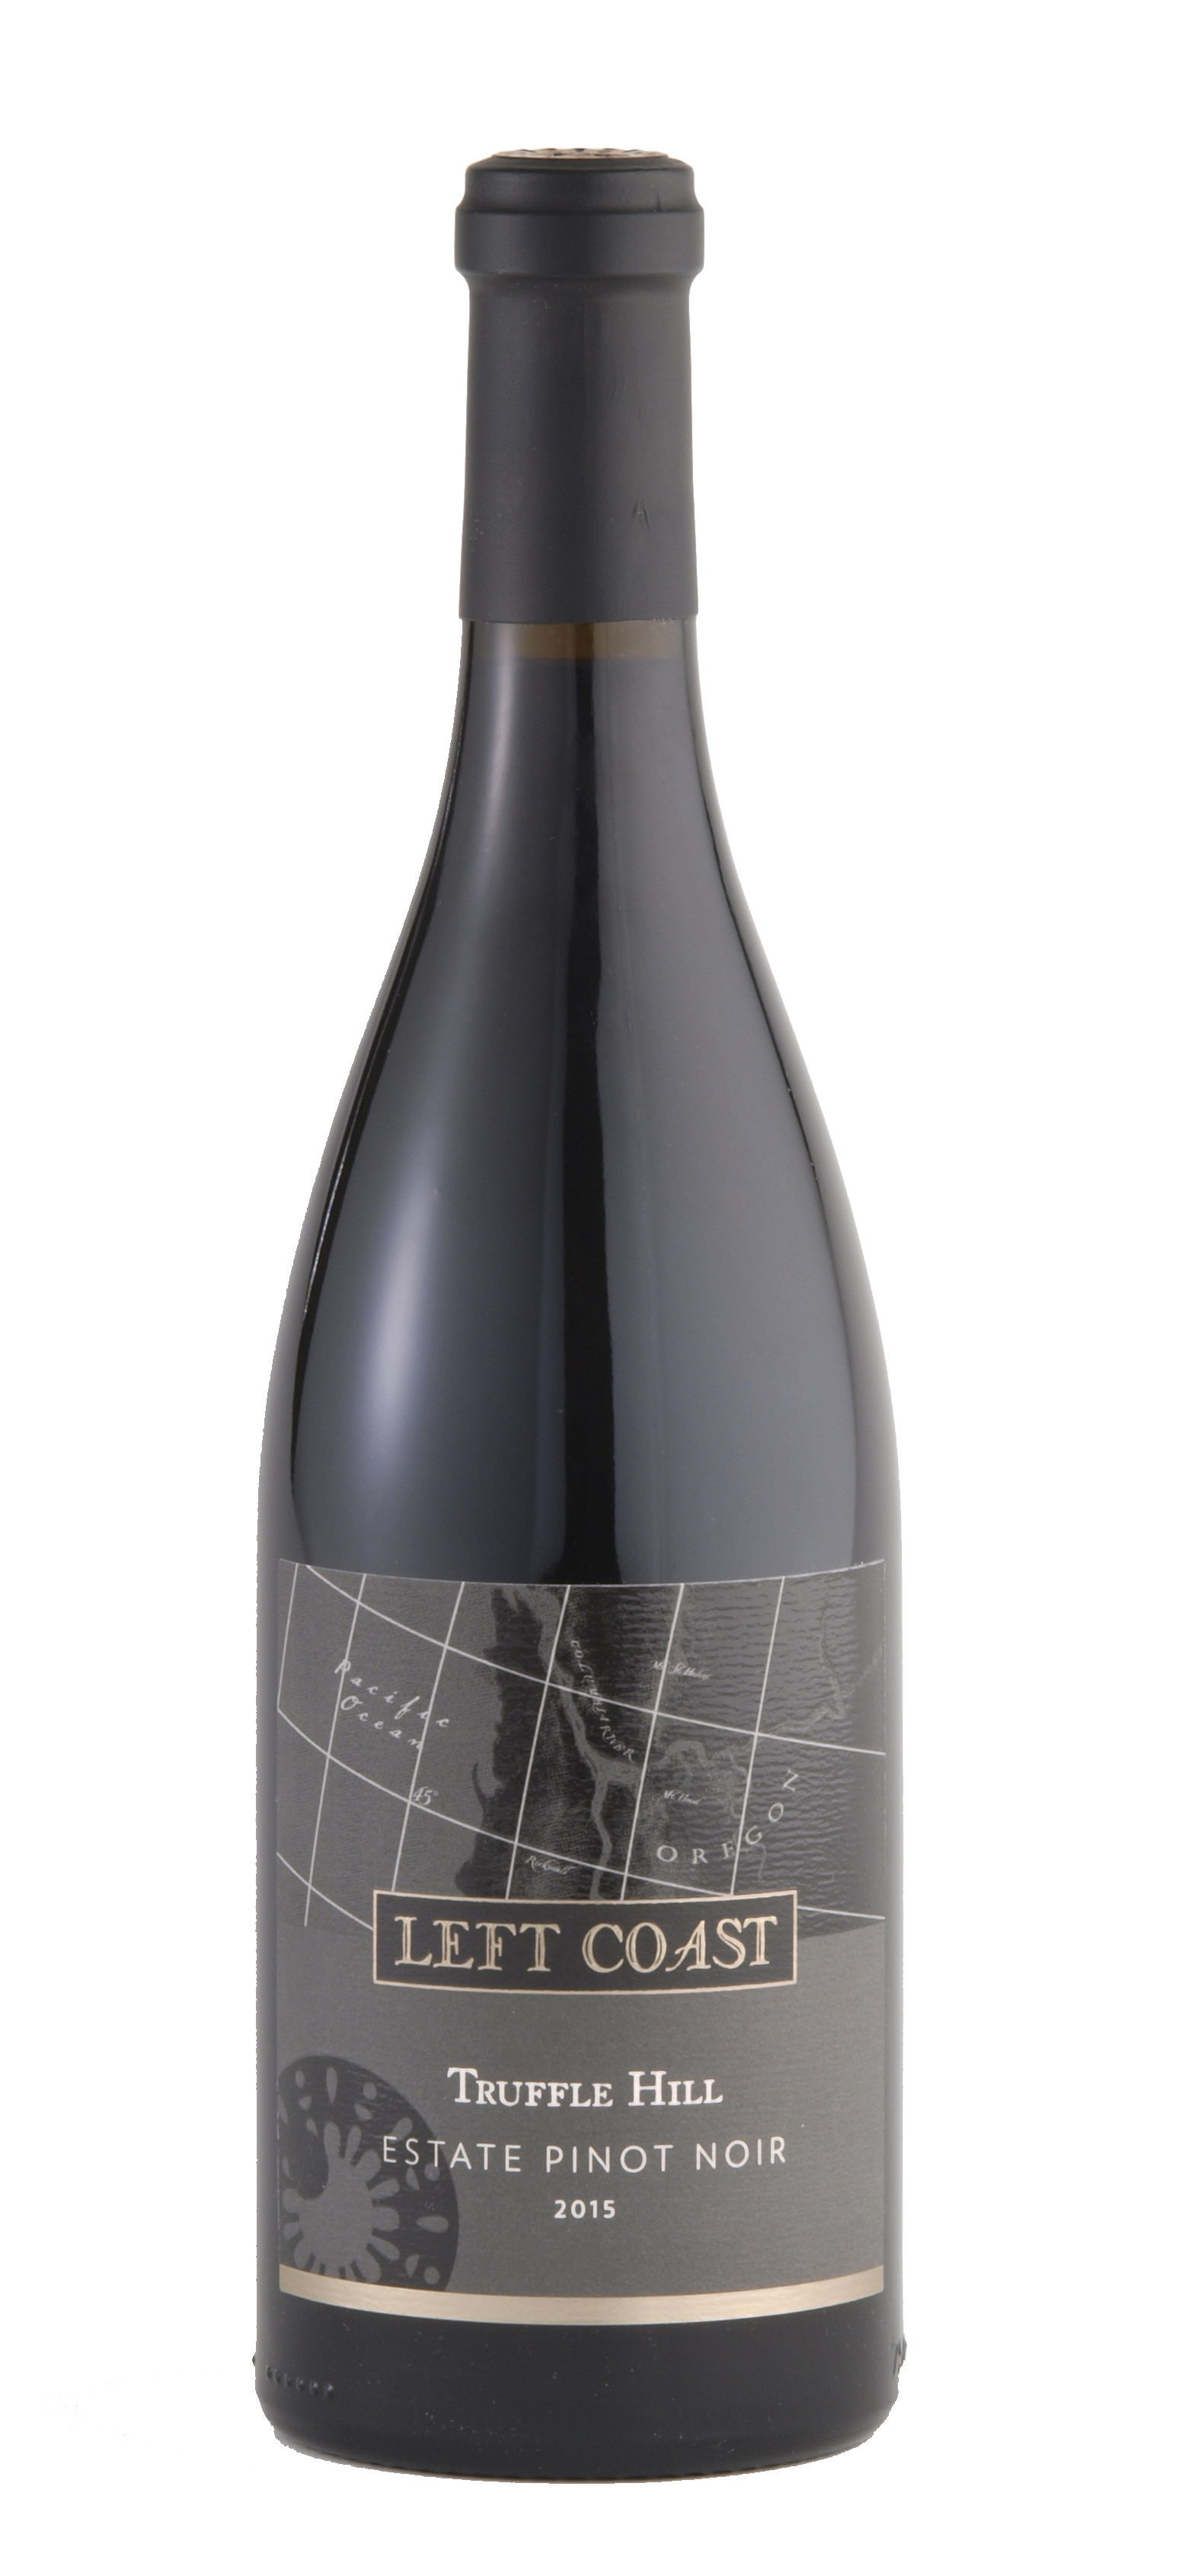 2015 Truffle Hill bottle shot .png